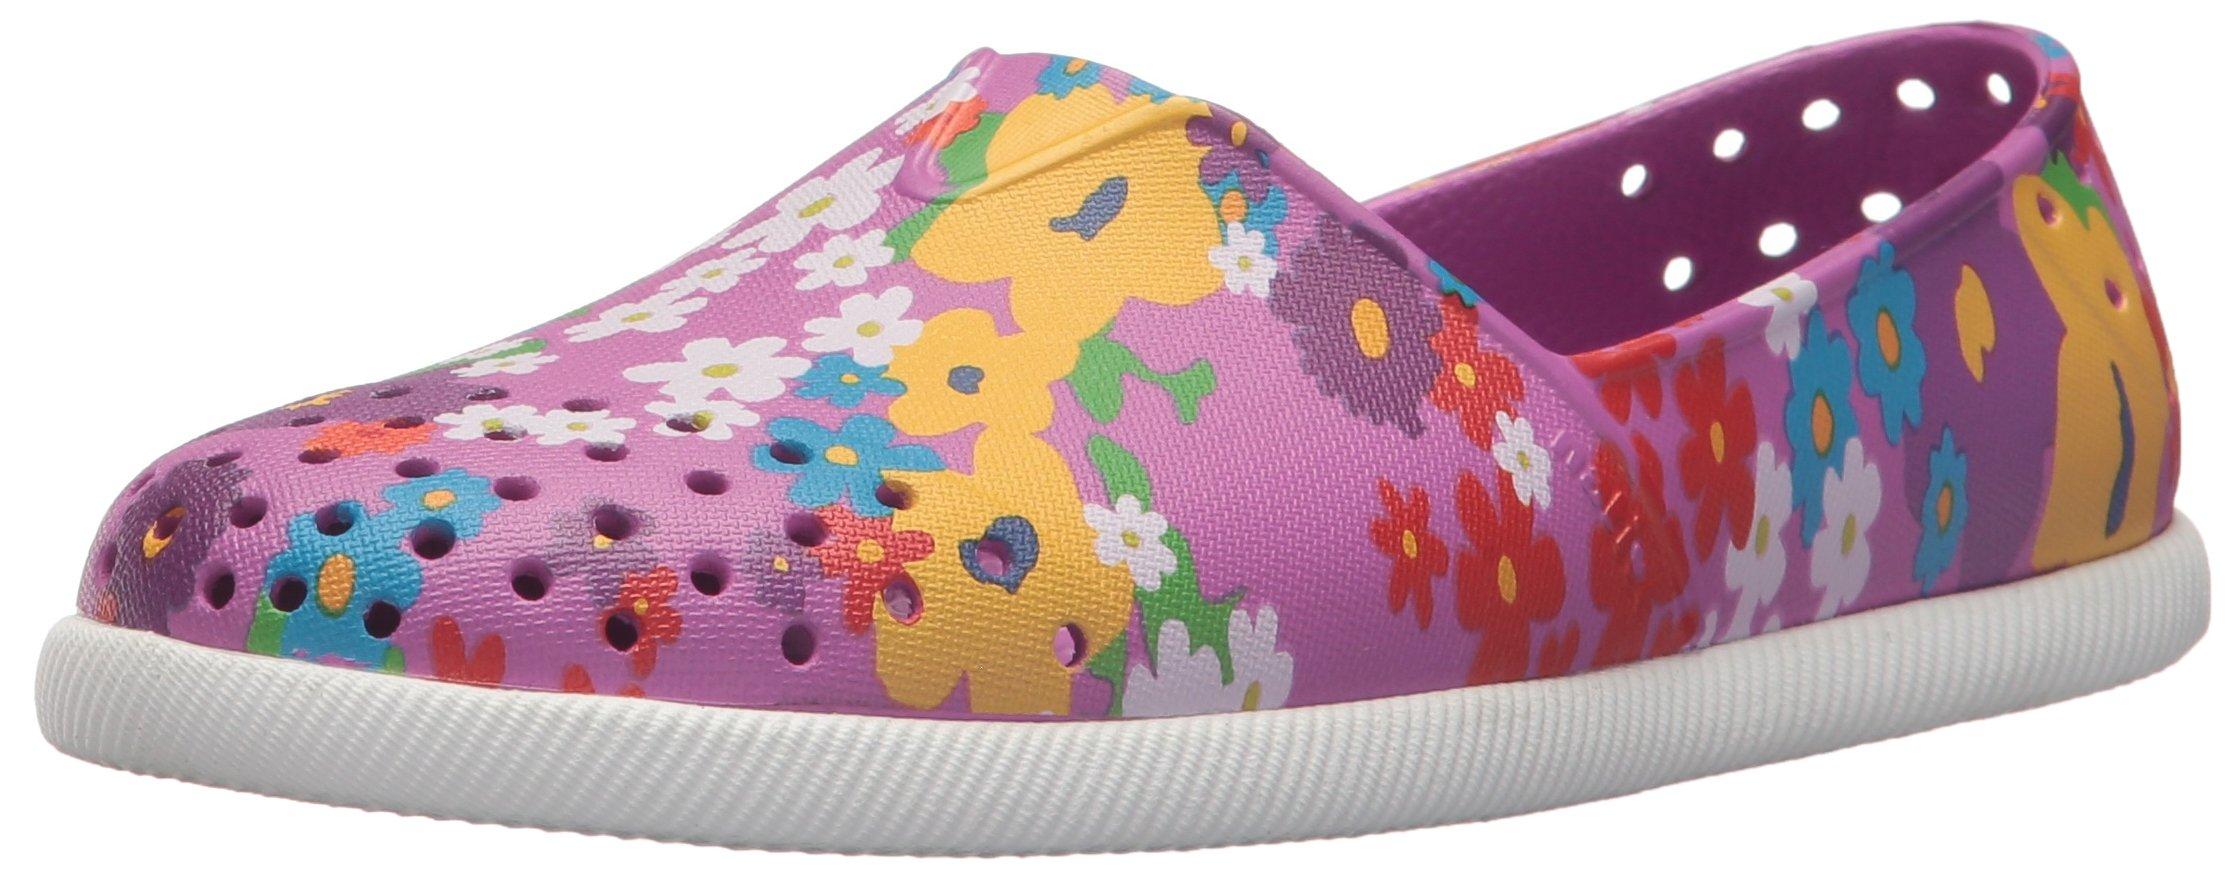 Native Kids' Verona Print Junior Water Shoe, Peace Purple/Daisy Chain, 1 Medium US Little Kid